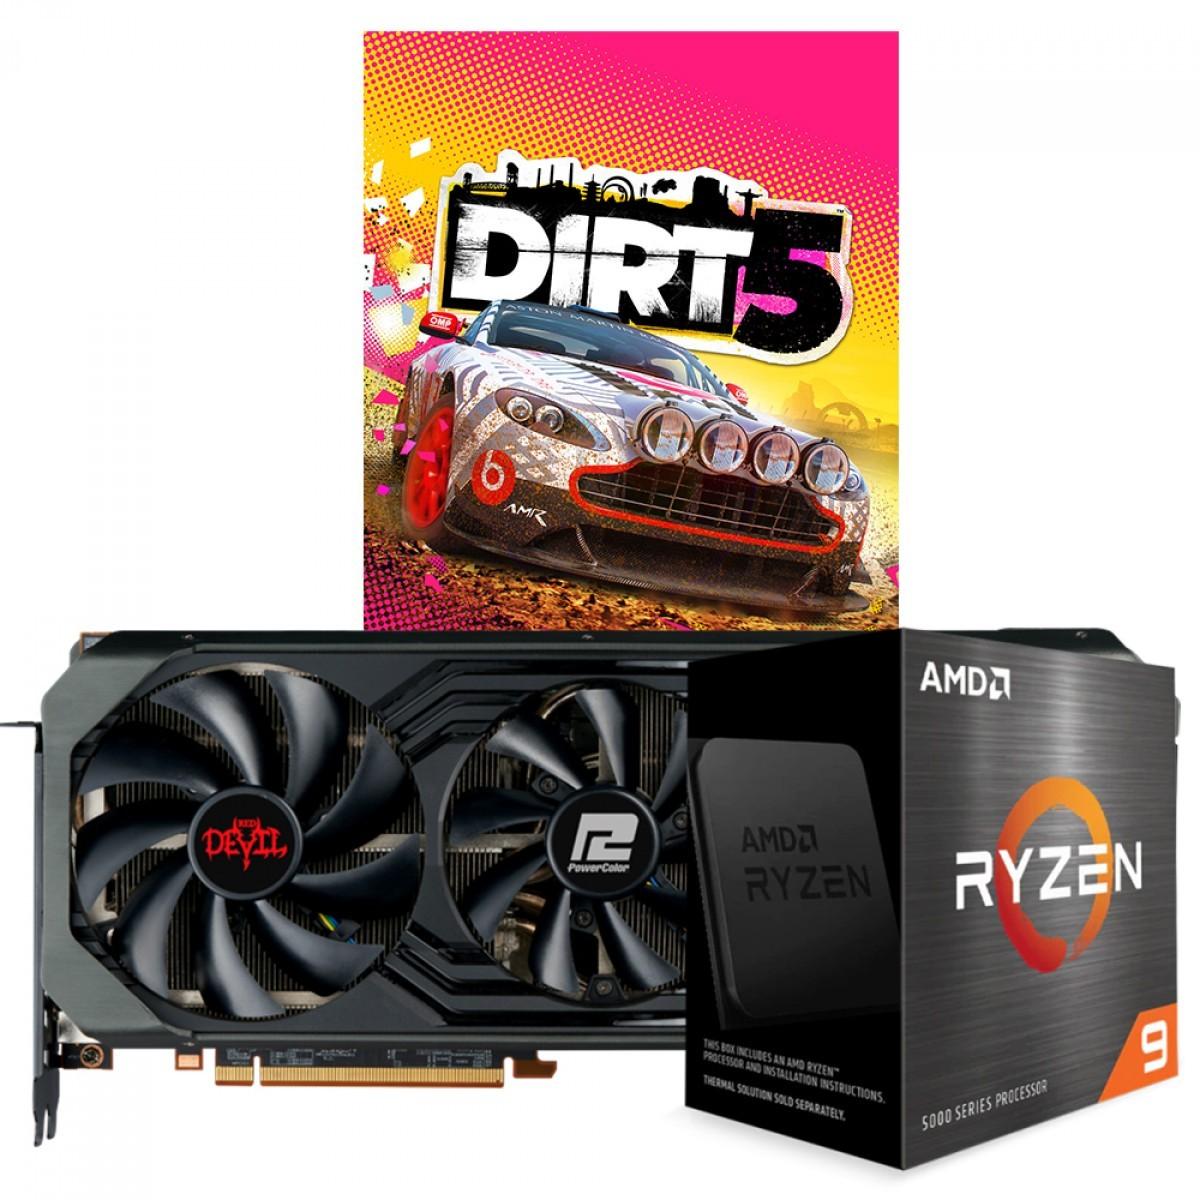 Kit Upgrade PowerColor Radeon RX 6900 XT Red Devil + AMD Ryzen 9 5900X + Brinde Jogo Dirt 5